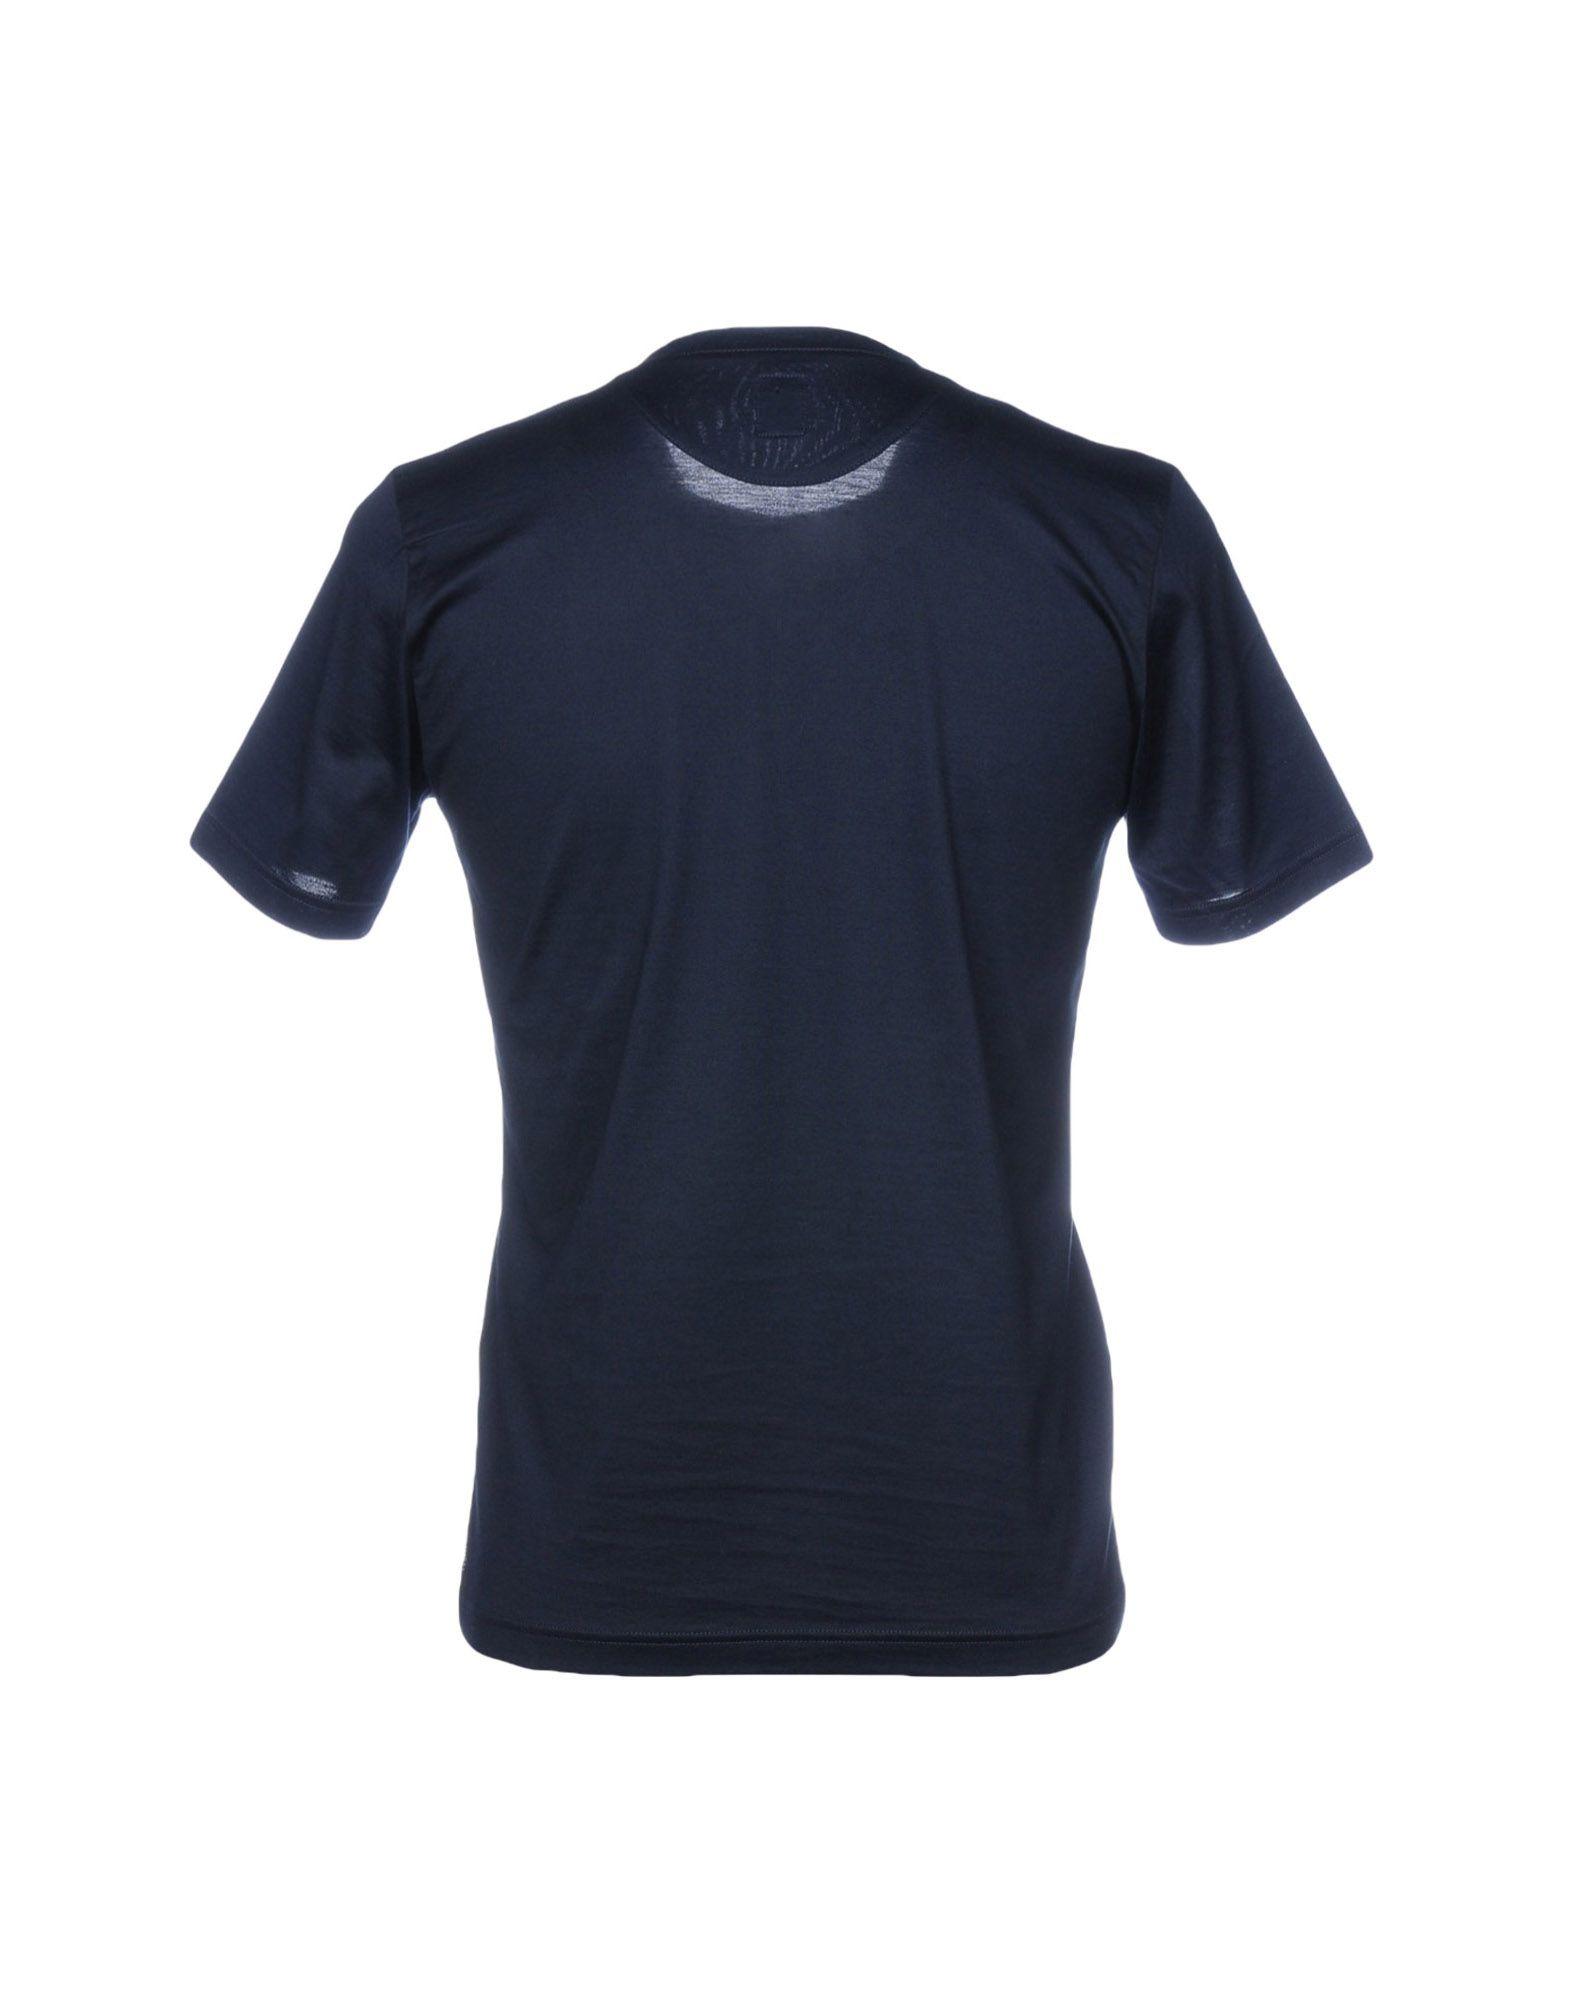 A buon mercato mercato A buon mercato mercato T-Shirt Eleventy Uomo - 12195154FQ 5fa056